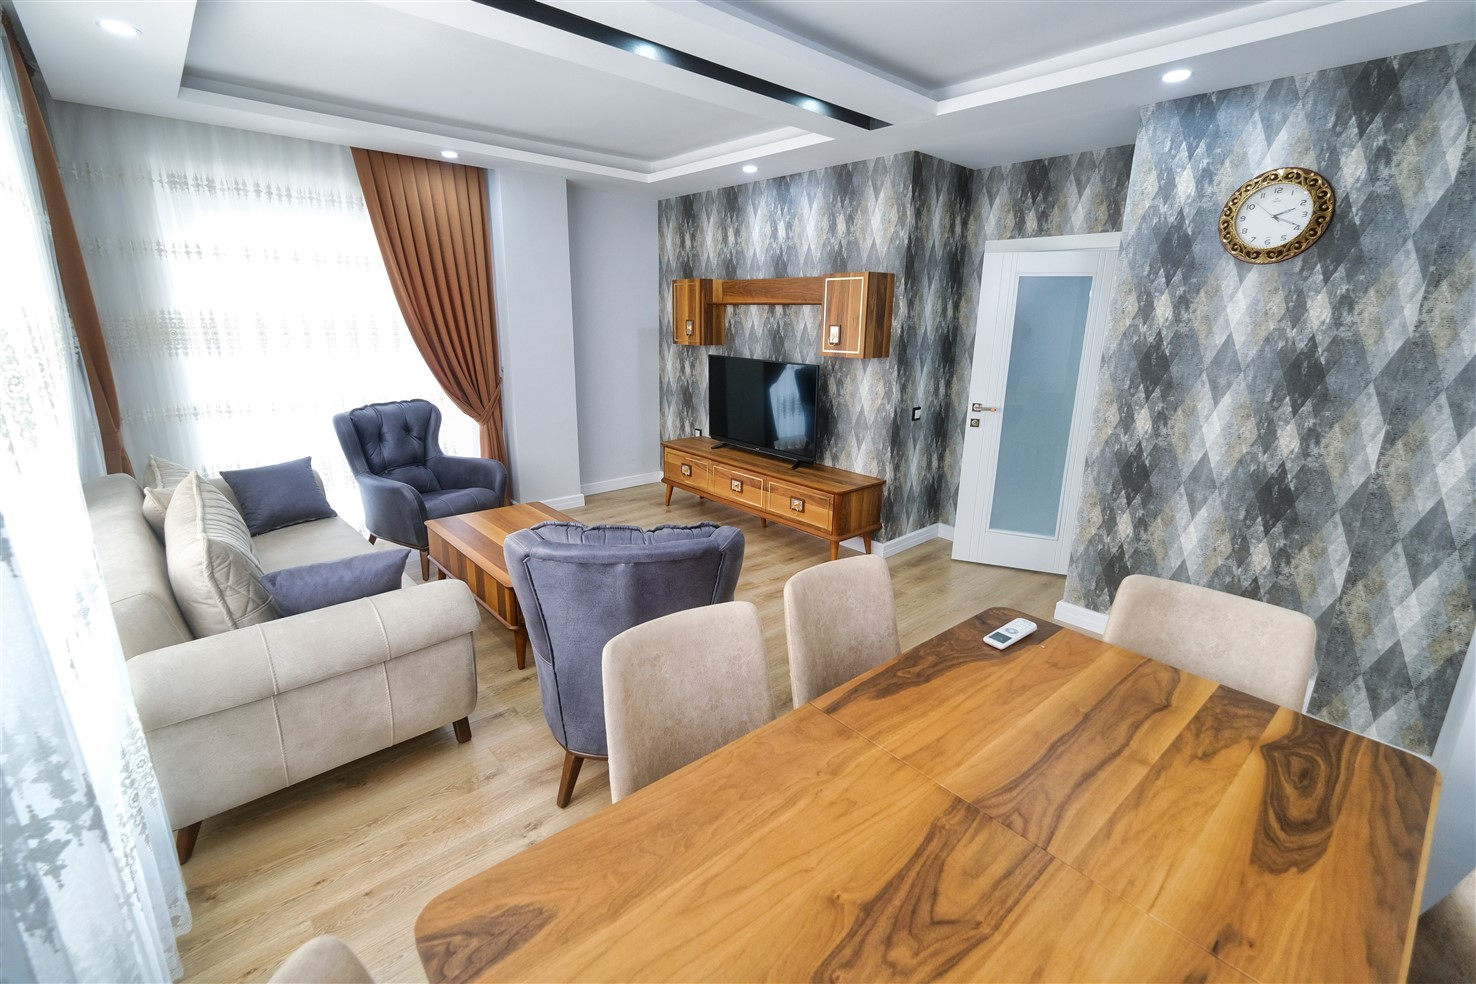 Трёхкомнатная квартира в центре Антальи - Фото 23